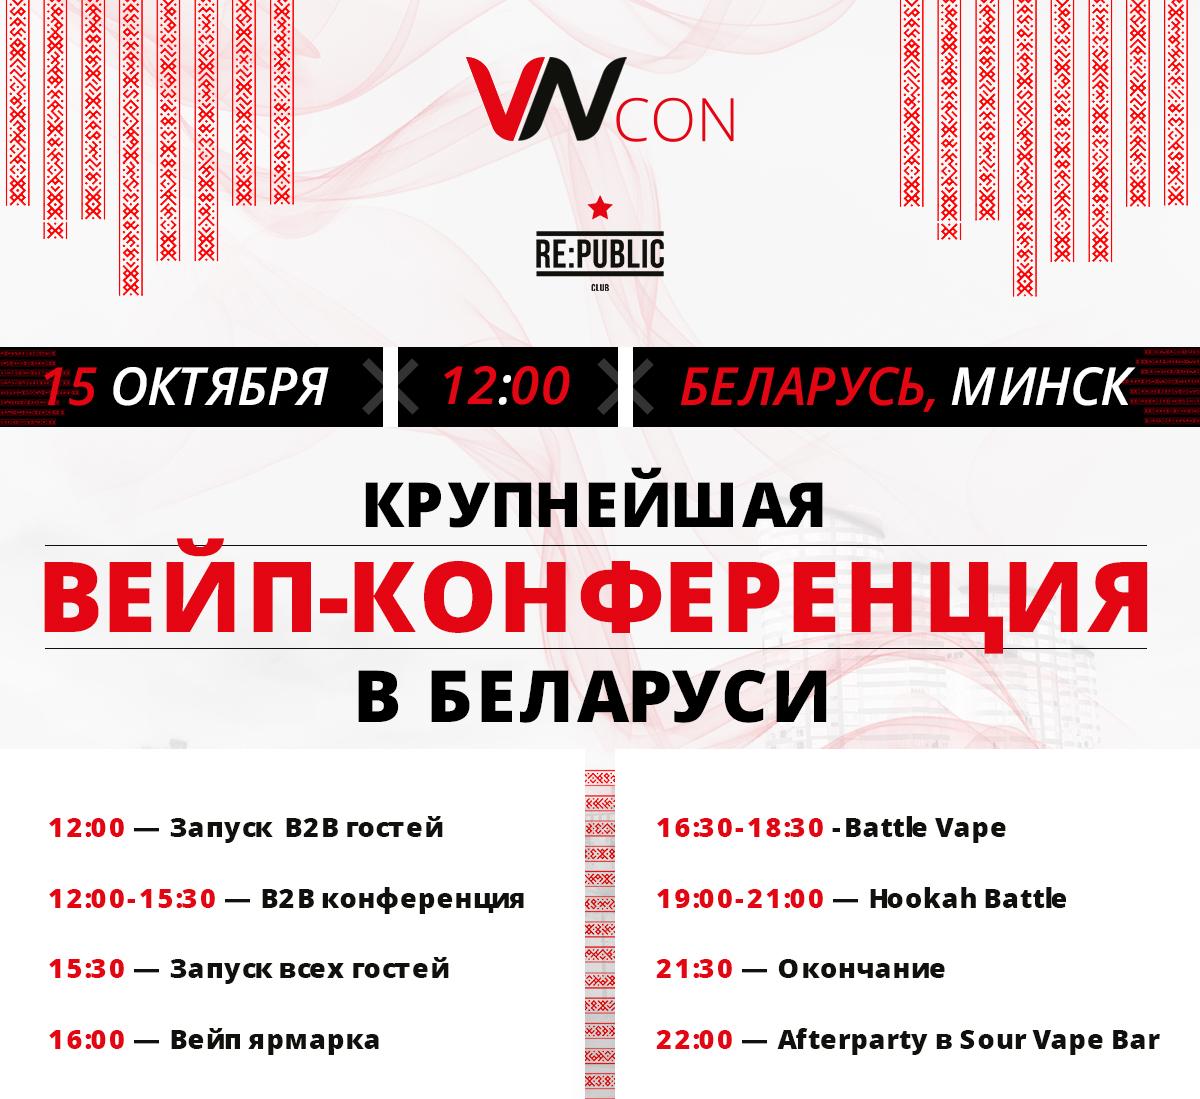 Крупнейшая вейп-конференция в Беларуси VN CON